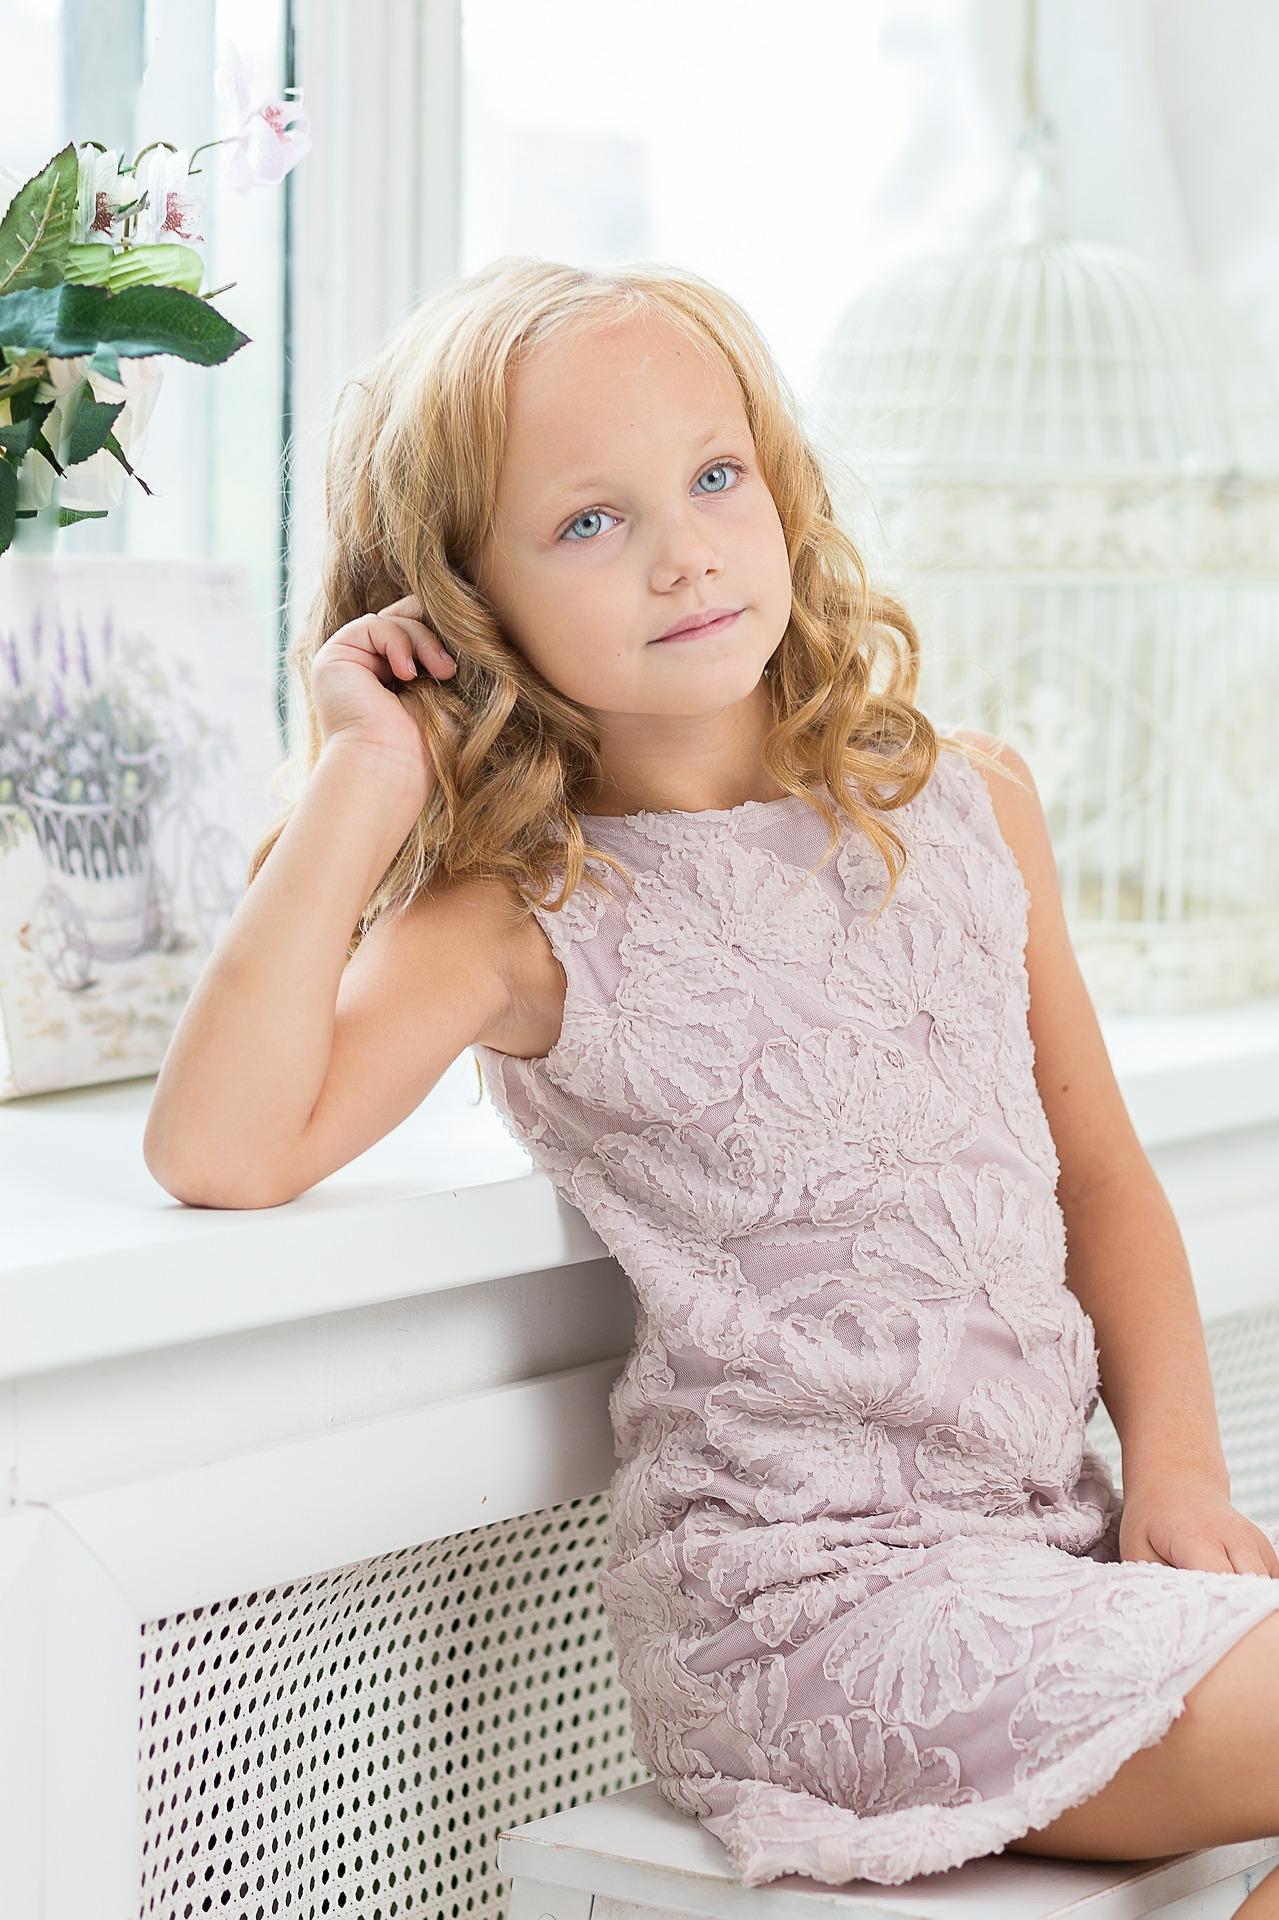 jeune fille comédienne